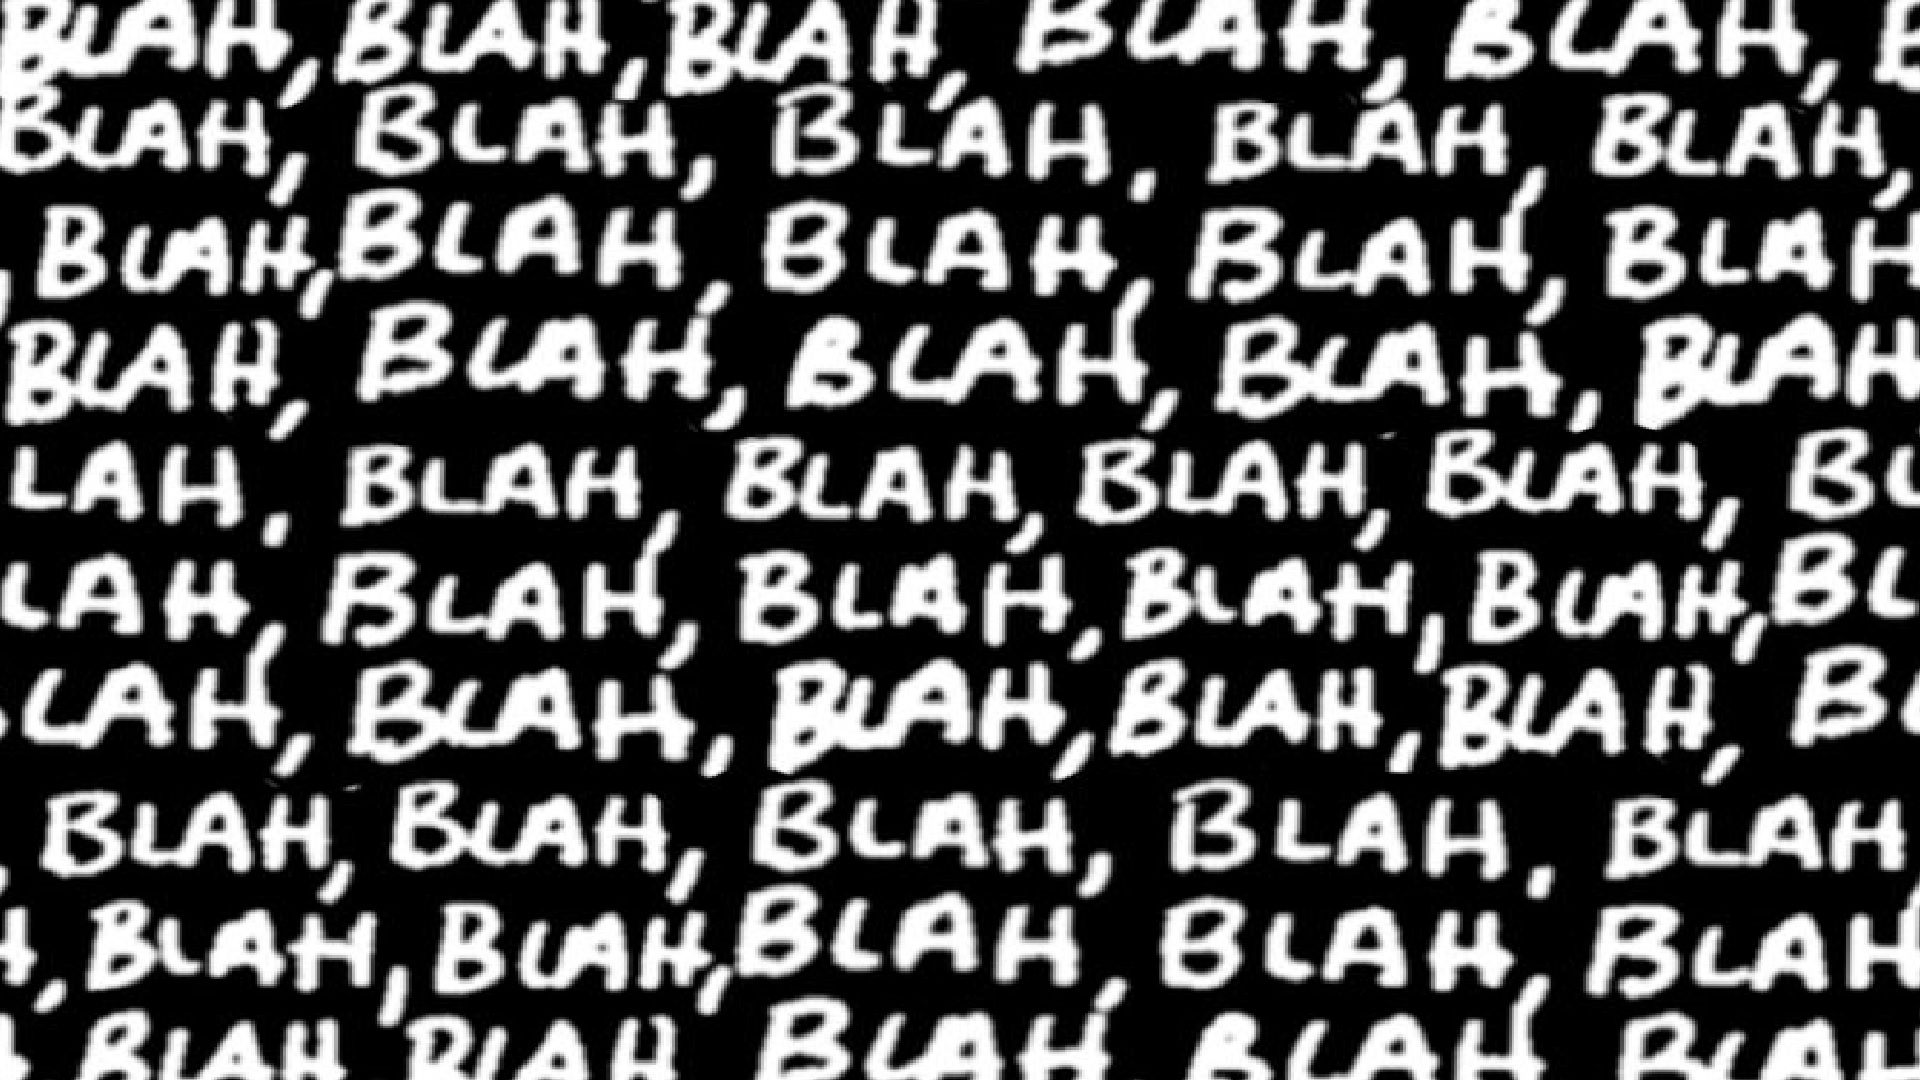 Image result for blah blah blah blah